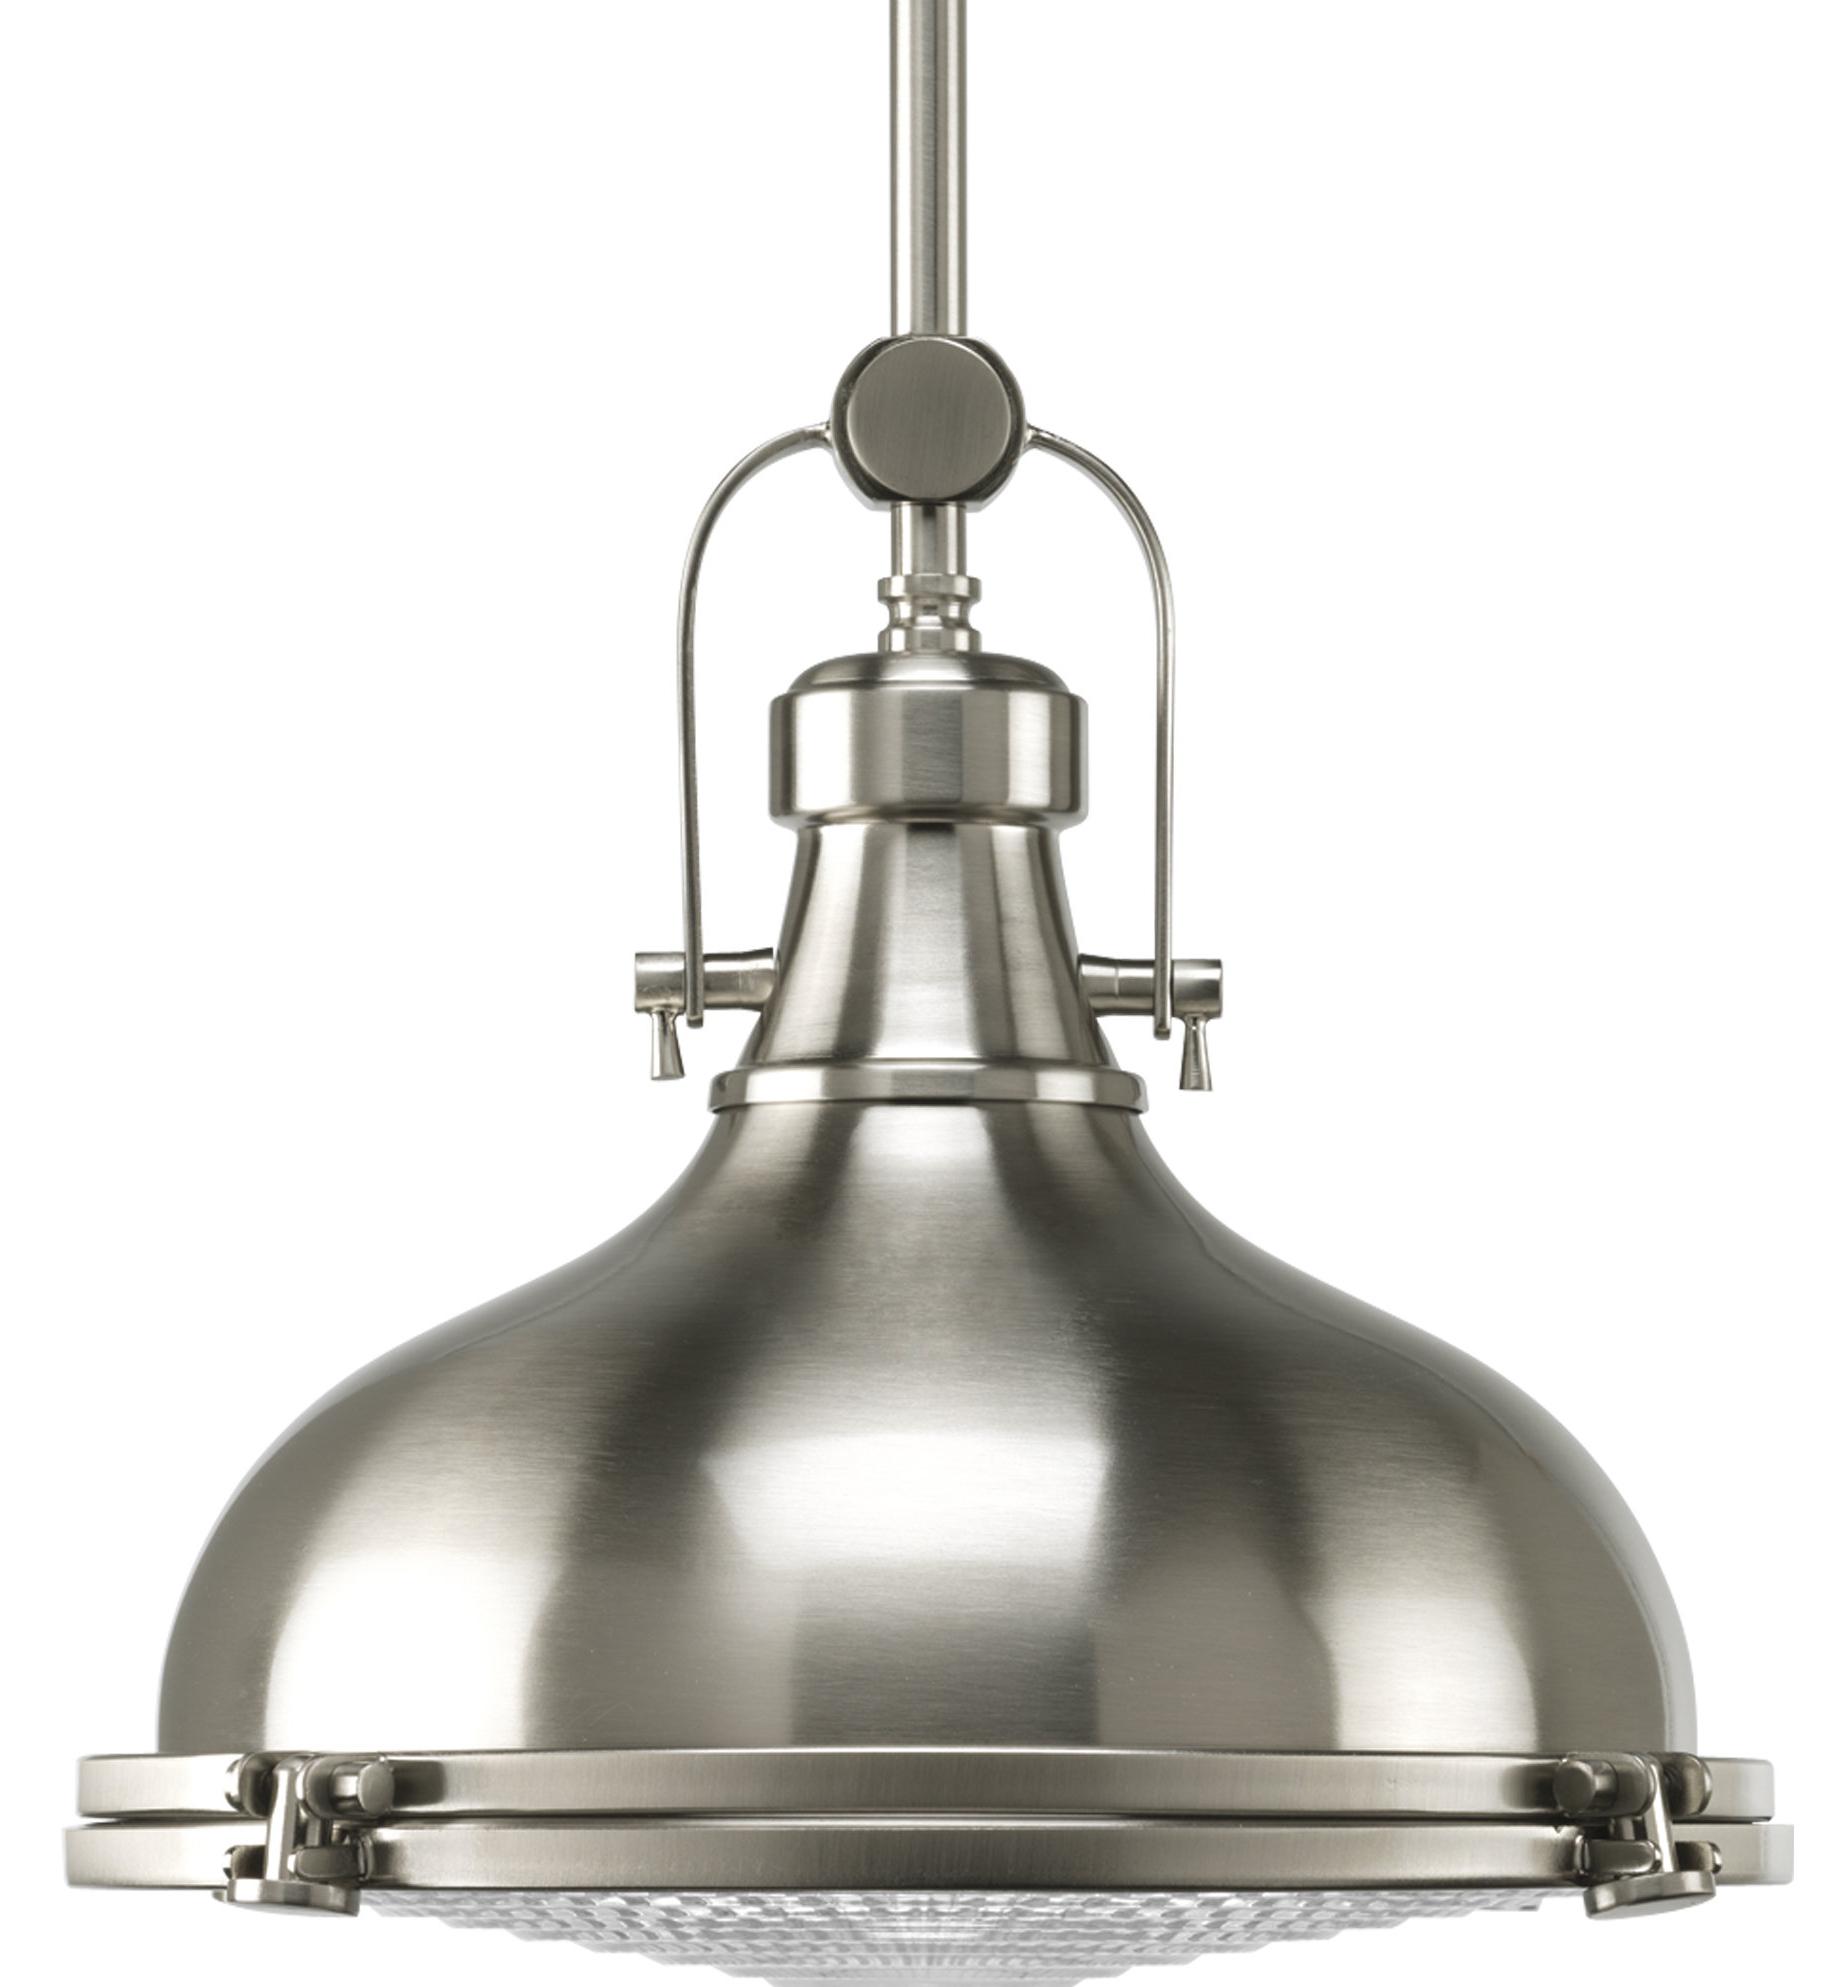 2020 Laurel Foundry Modern Farmhouse Freeda 1 Light Single Dome Pendant With Regard To Granville 3 Light Single Dome Pendants (View 3 of 20)